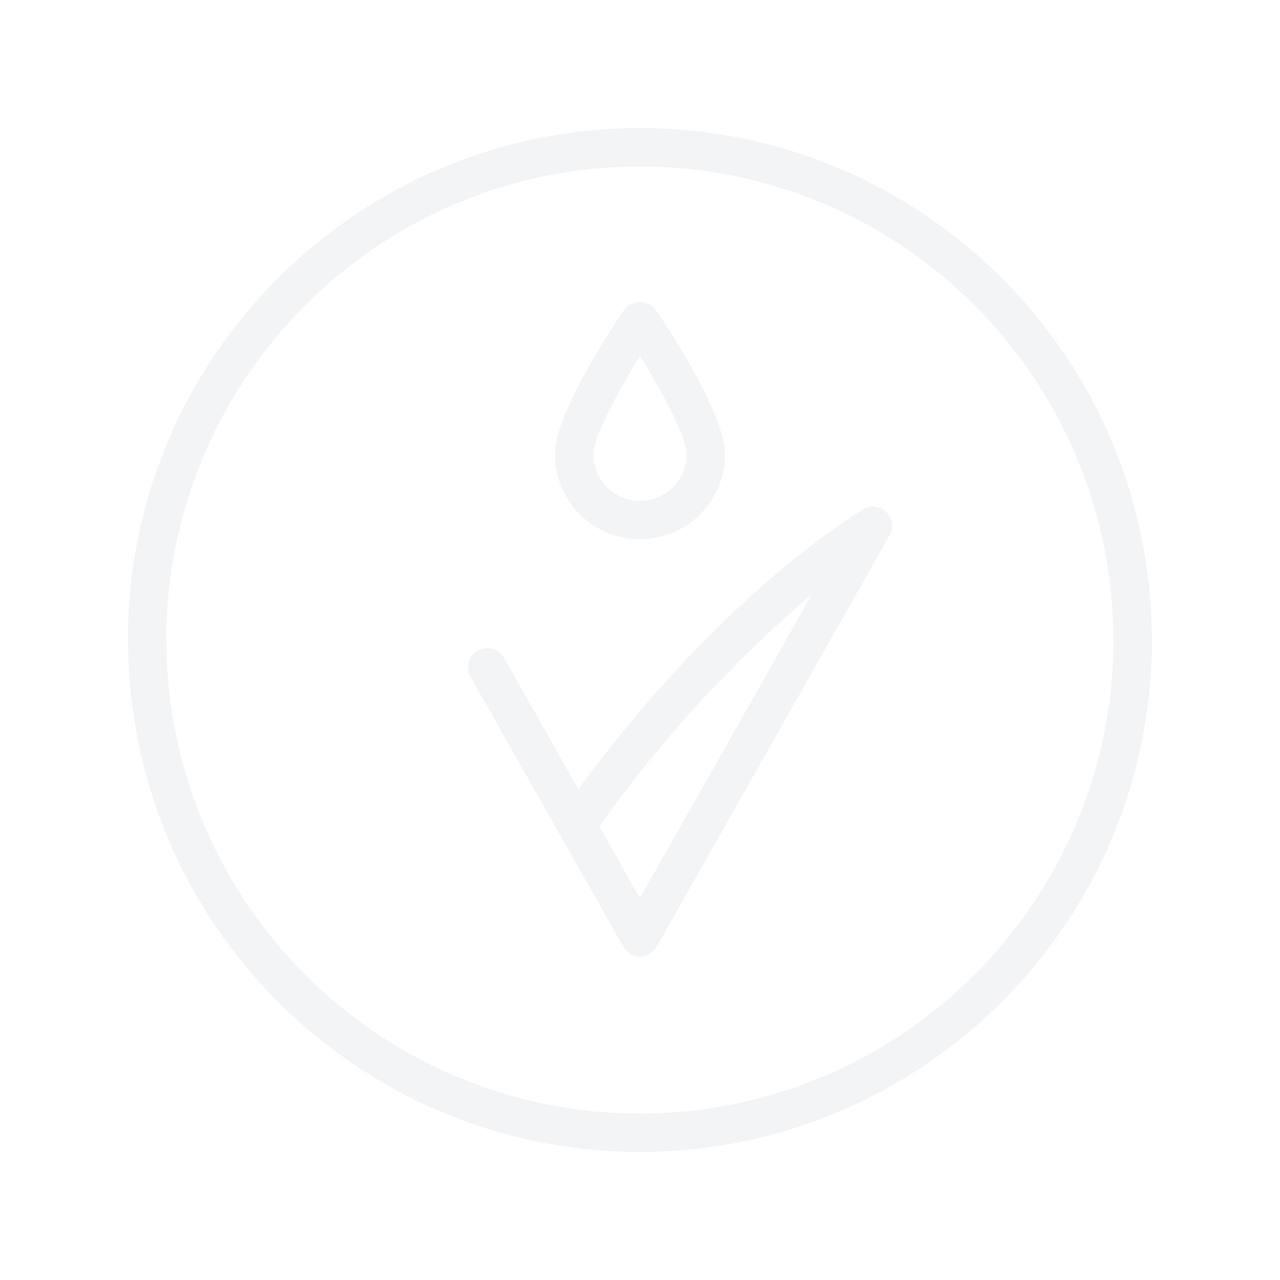 JOIK ORGANIC Moisture Balance Facial Cleansing Soap 100g